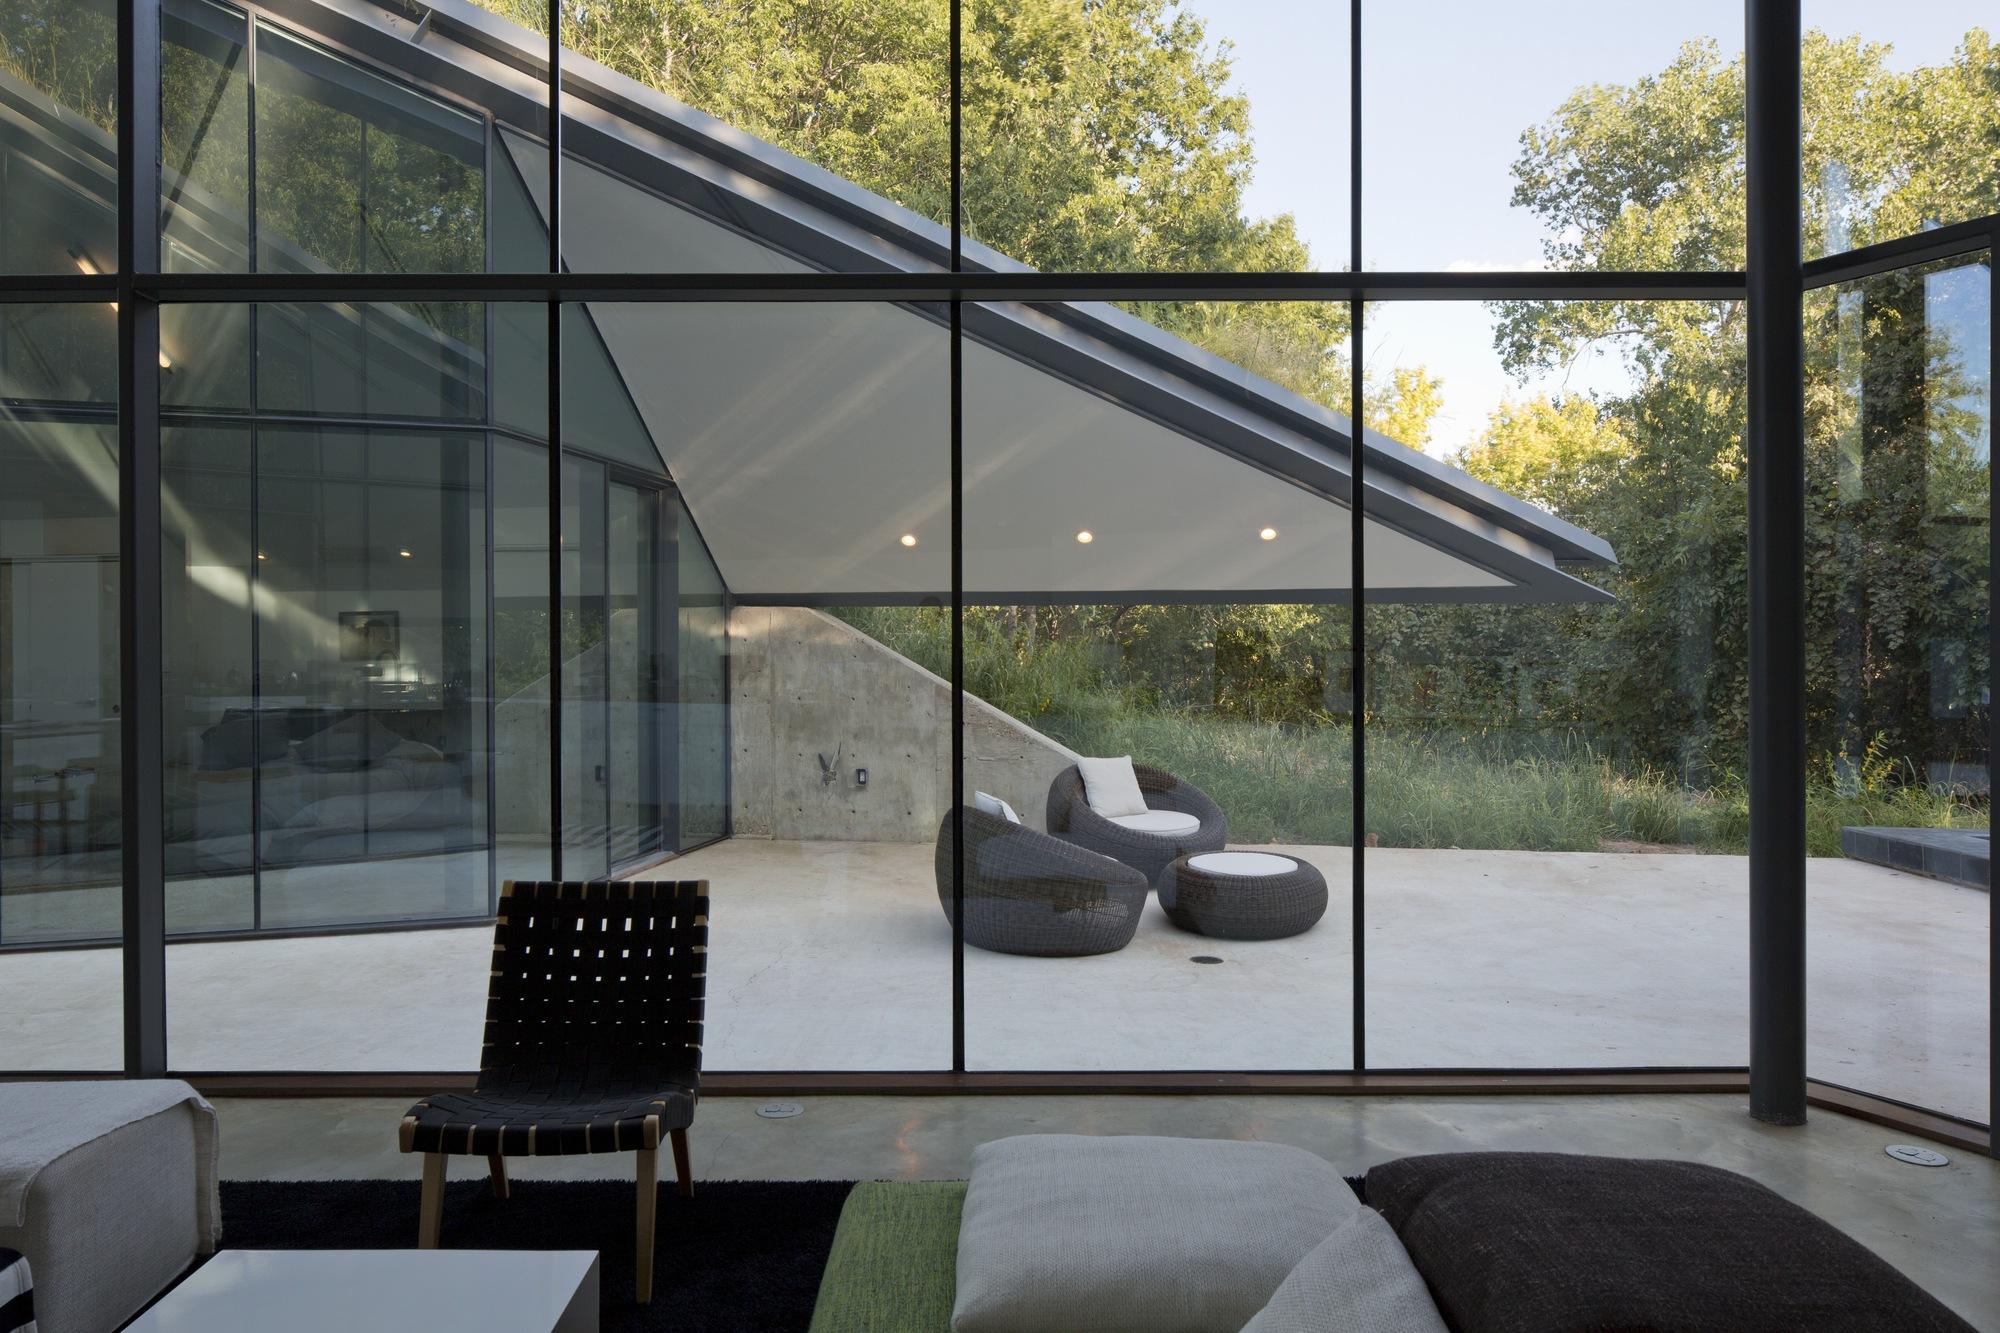 entreprise de peinture g n rale 91 essonnebaies vitr es. Black Bedroom Furniture Sets. Home Design Ideas